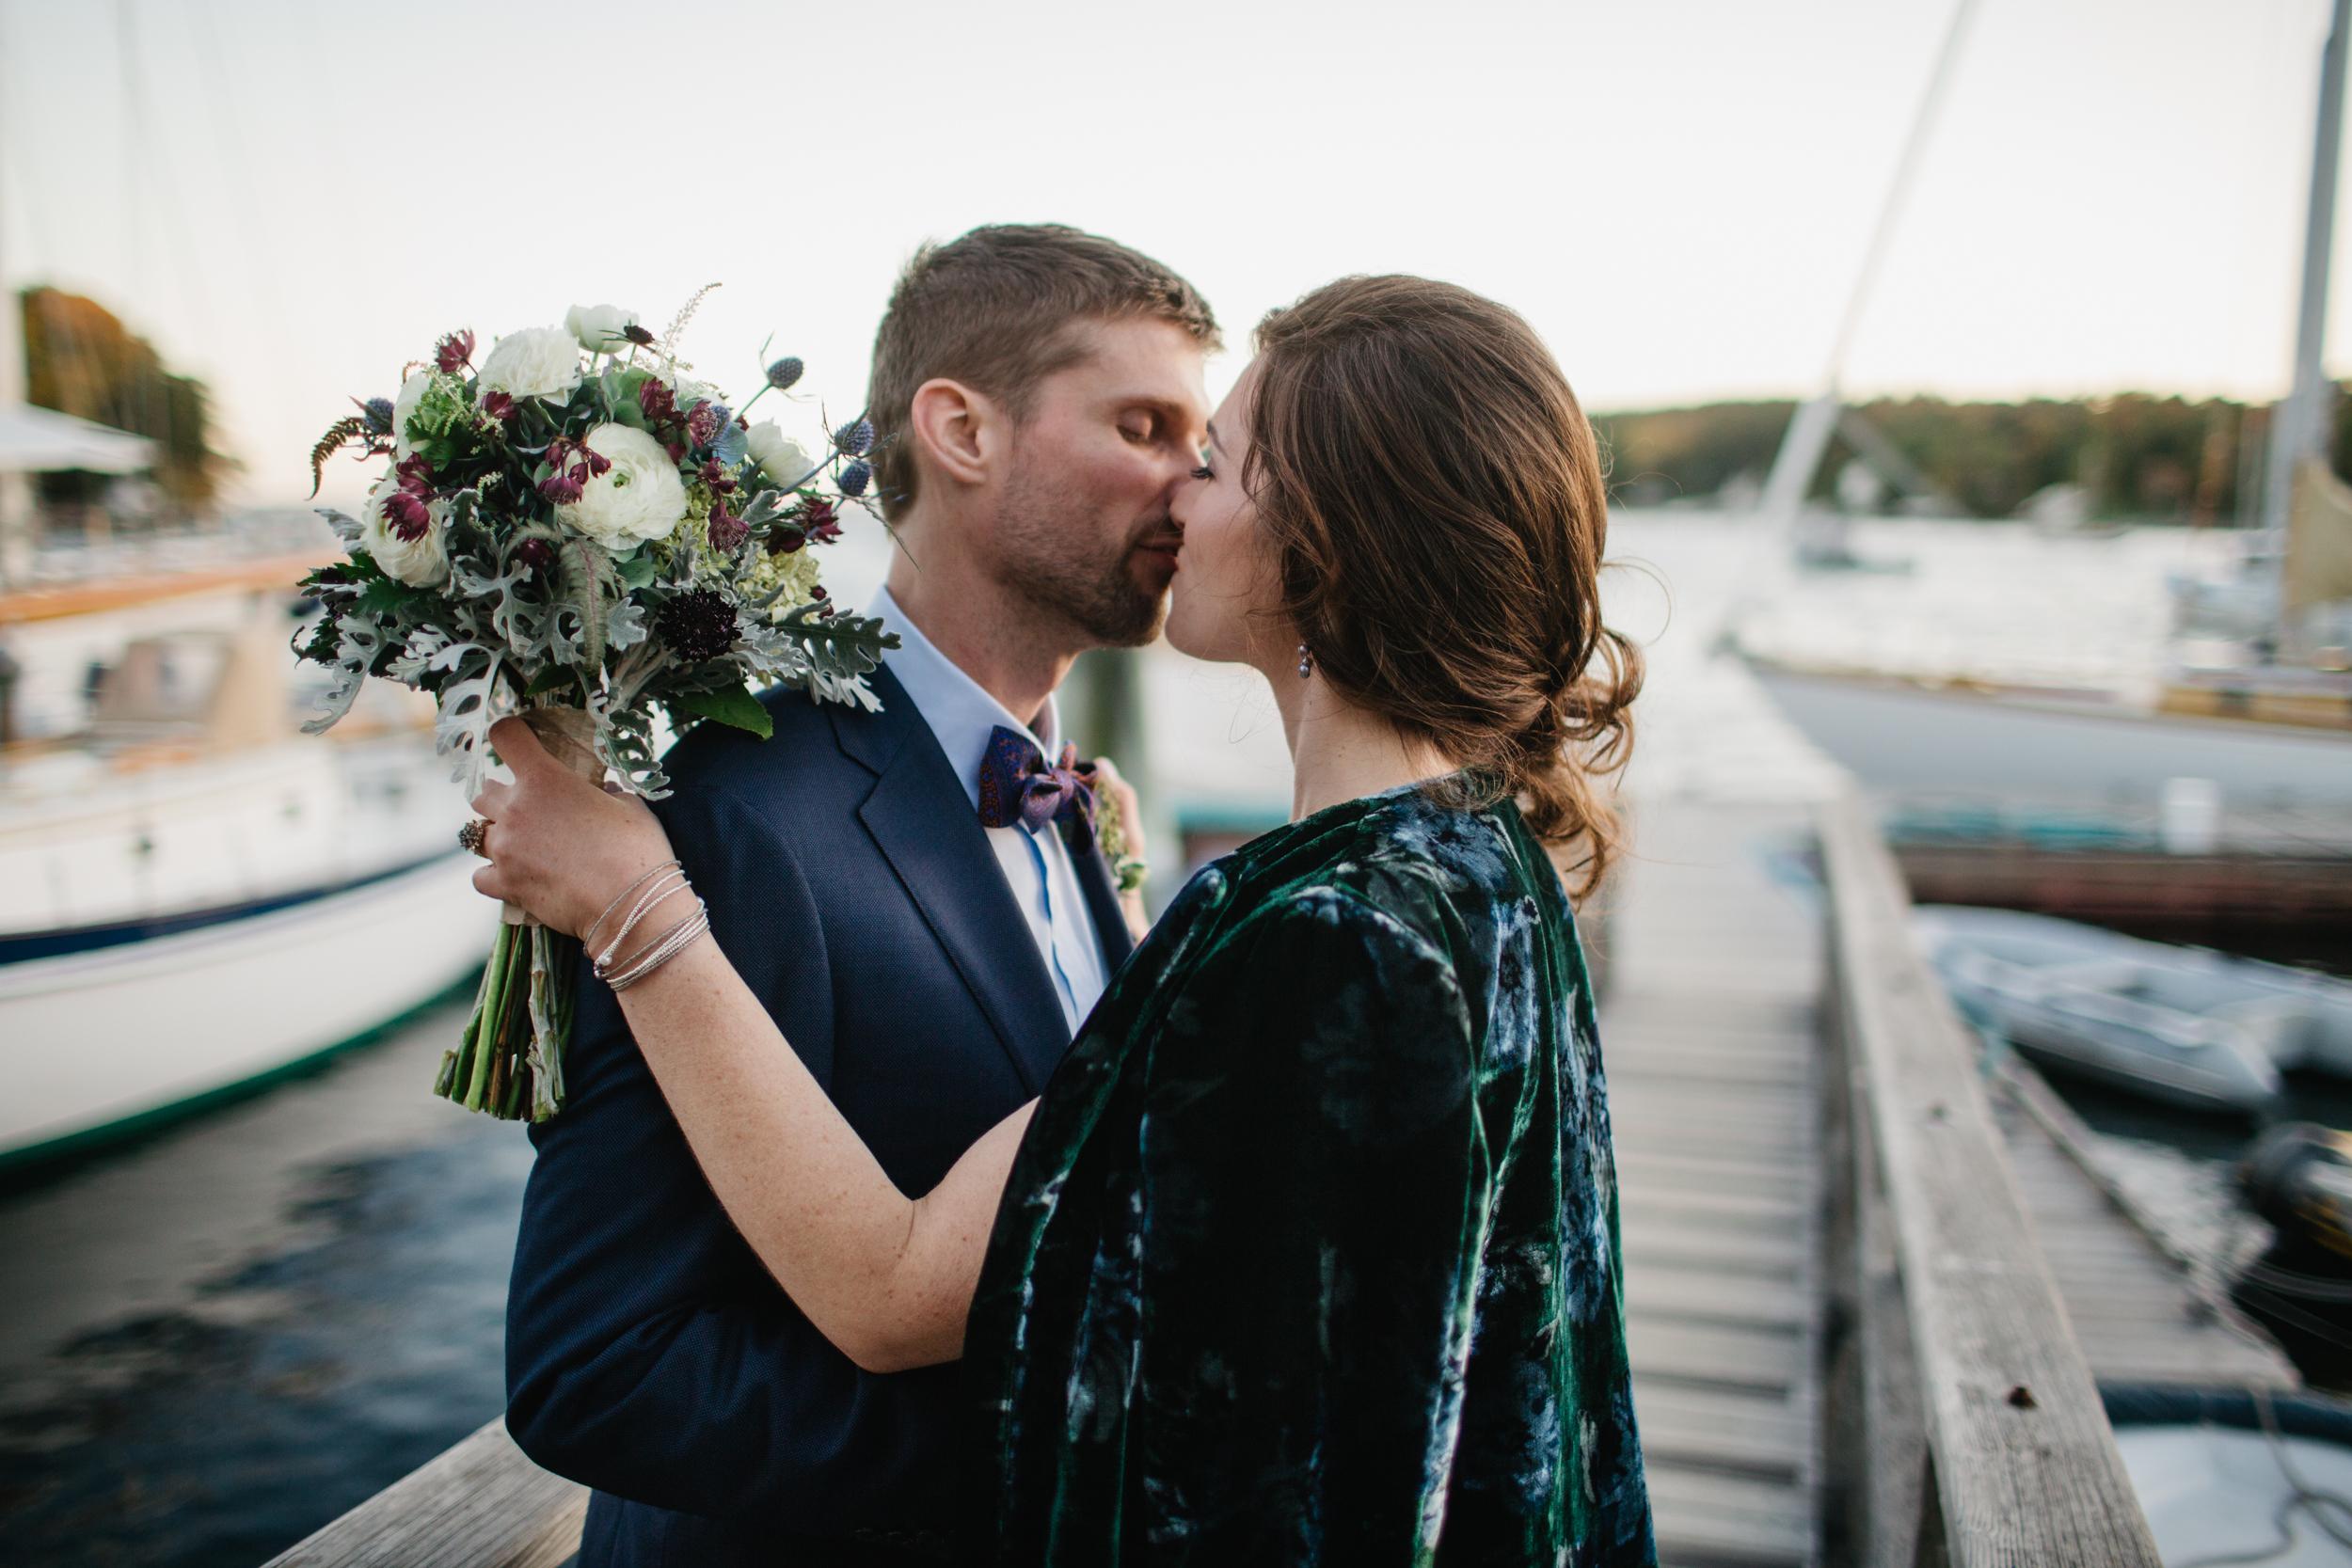 Mackenzie_Collins_Maine_wedding_in_Rockport_Union_hall_Nina_June_034.jpg